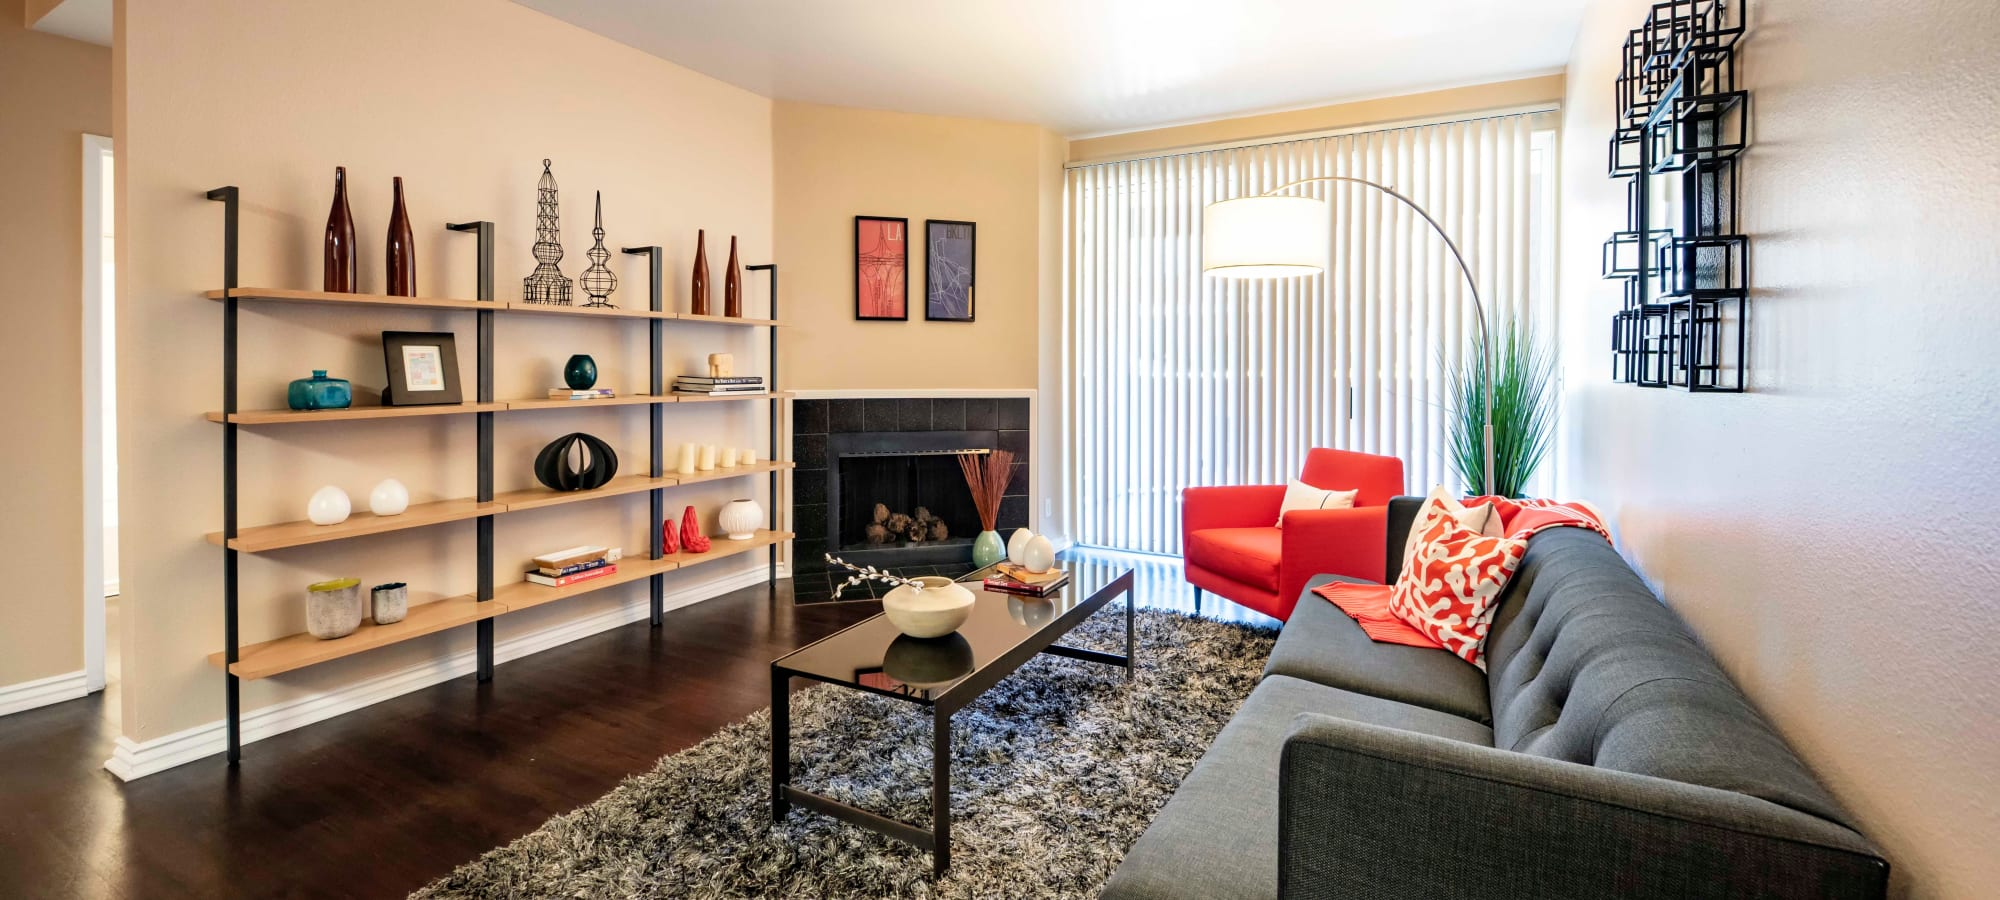 Corona, California apartments at Sierra Del Oro Apartments